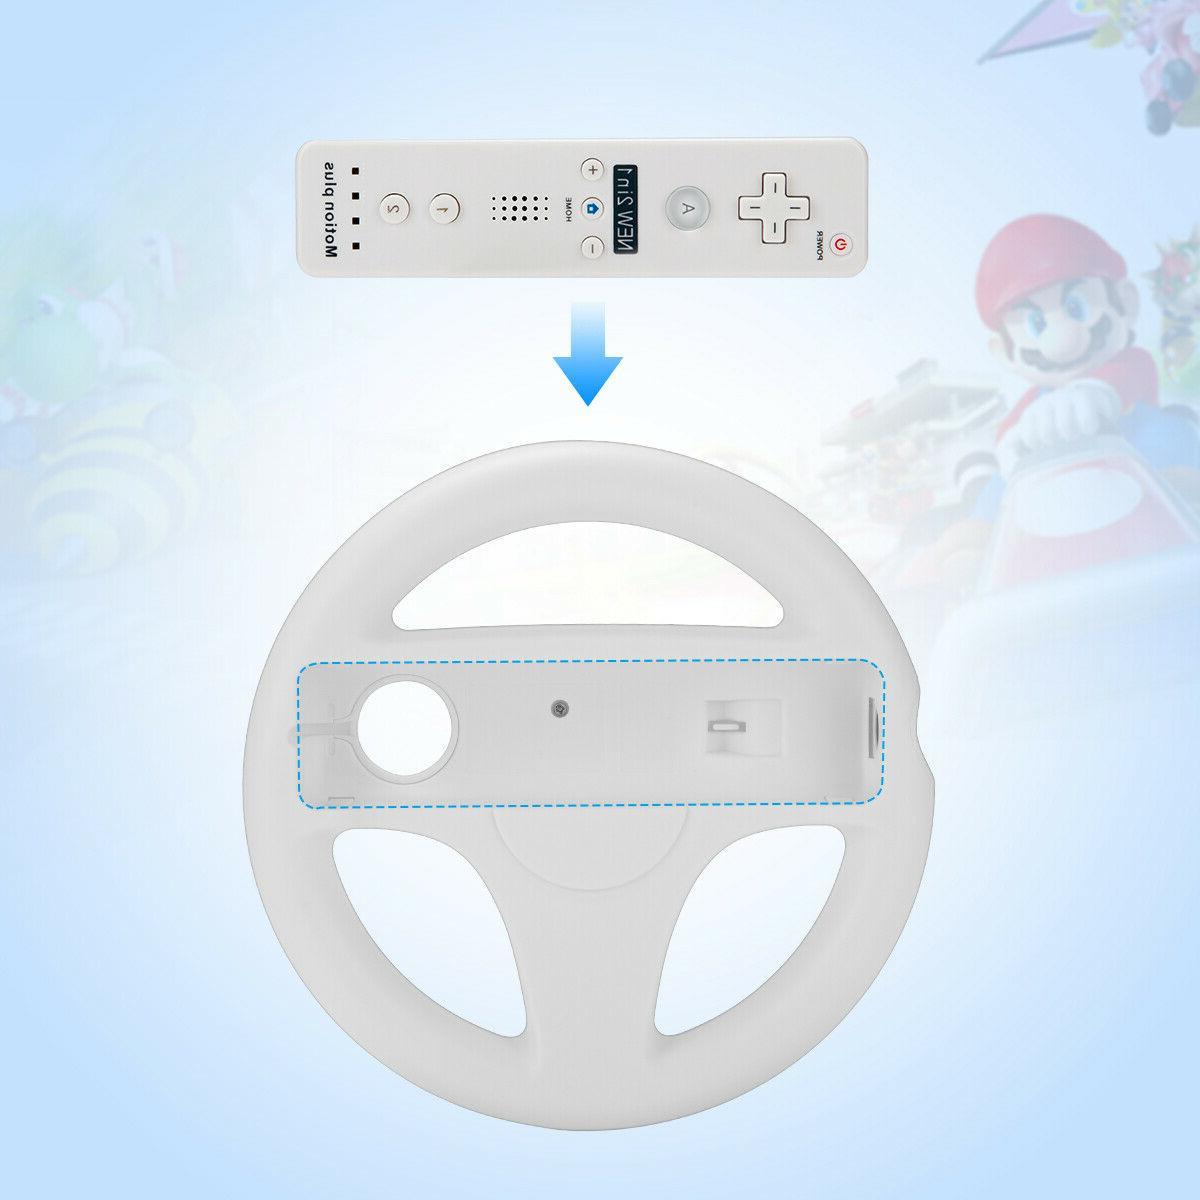 2Pc Wheel Wii Mario Kart Remote Controller